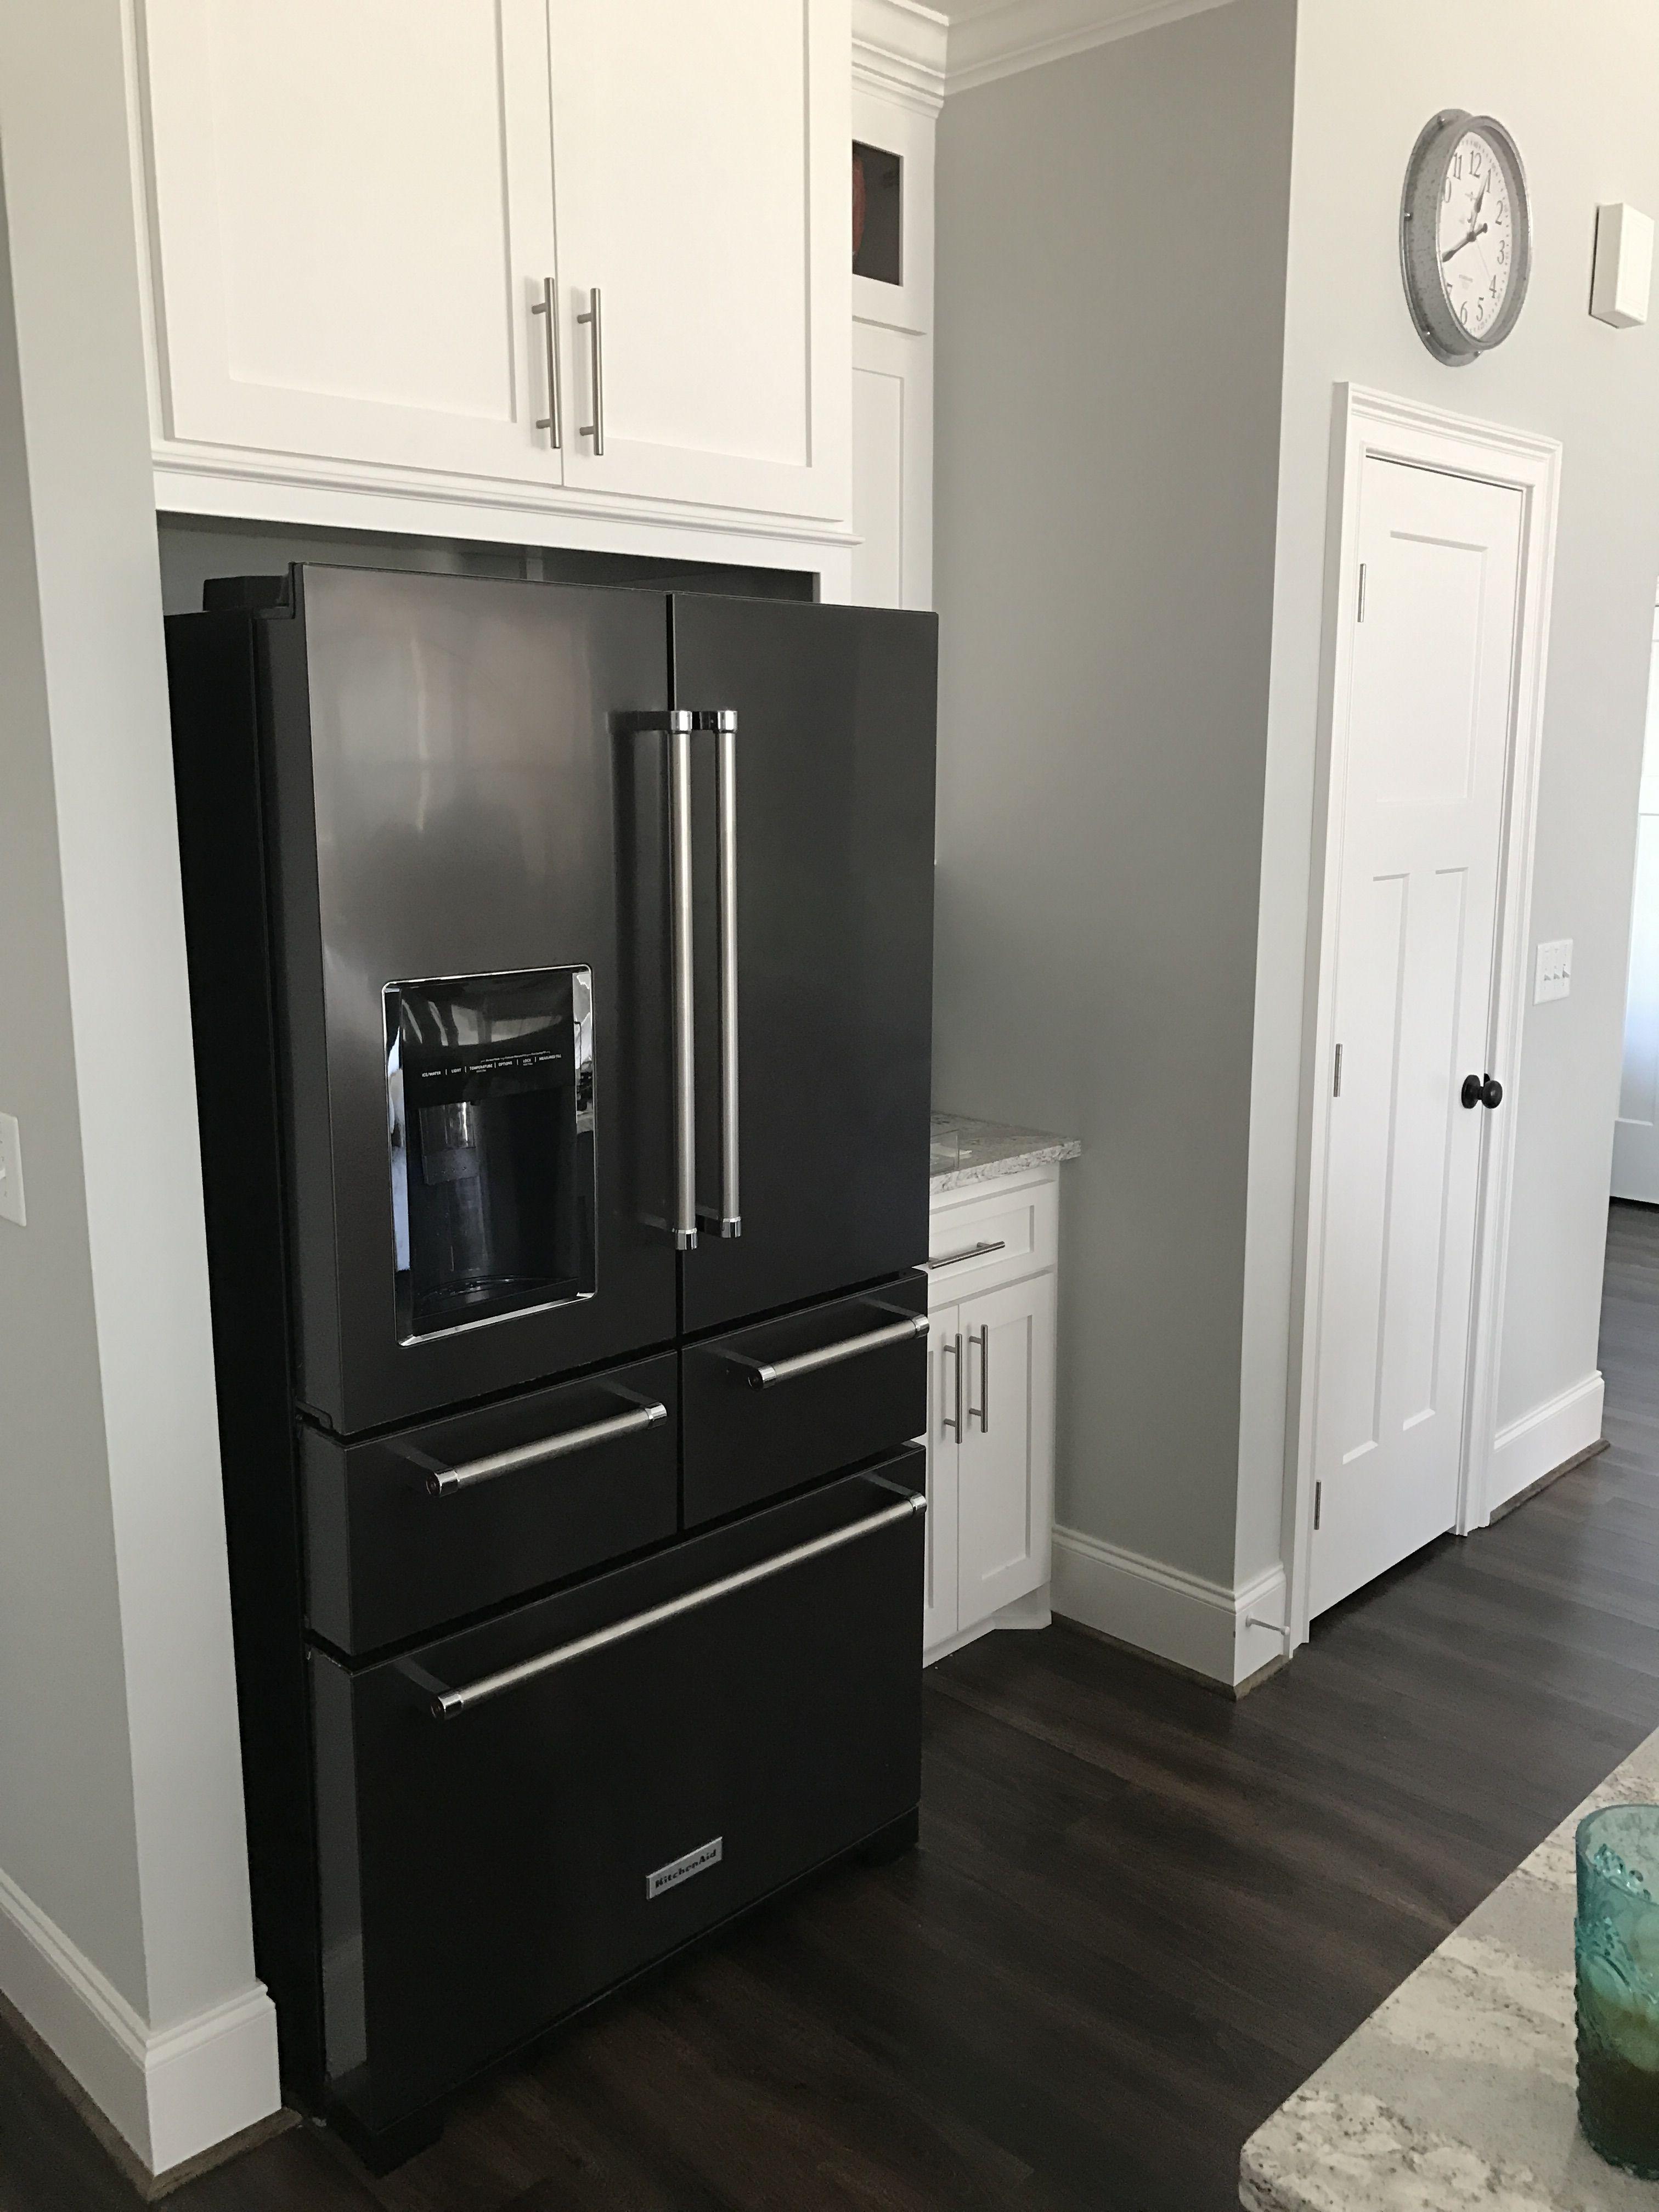 Black Stainless Kitchenaid Refrigerator Kitchen Aid Appliances